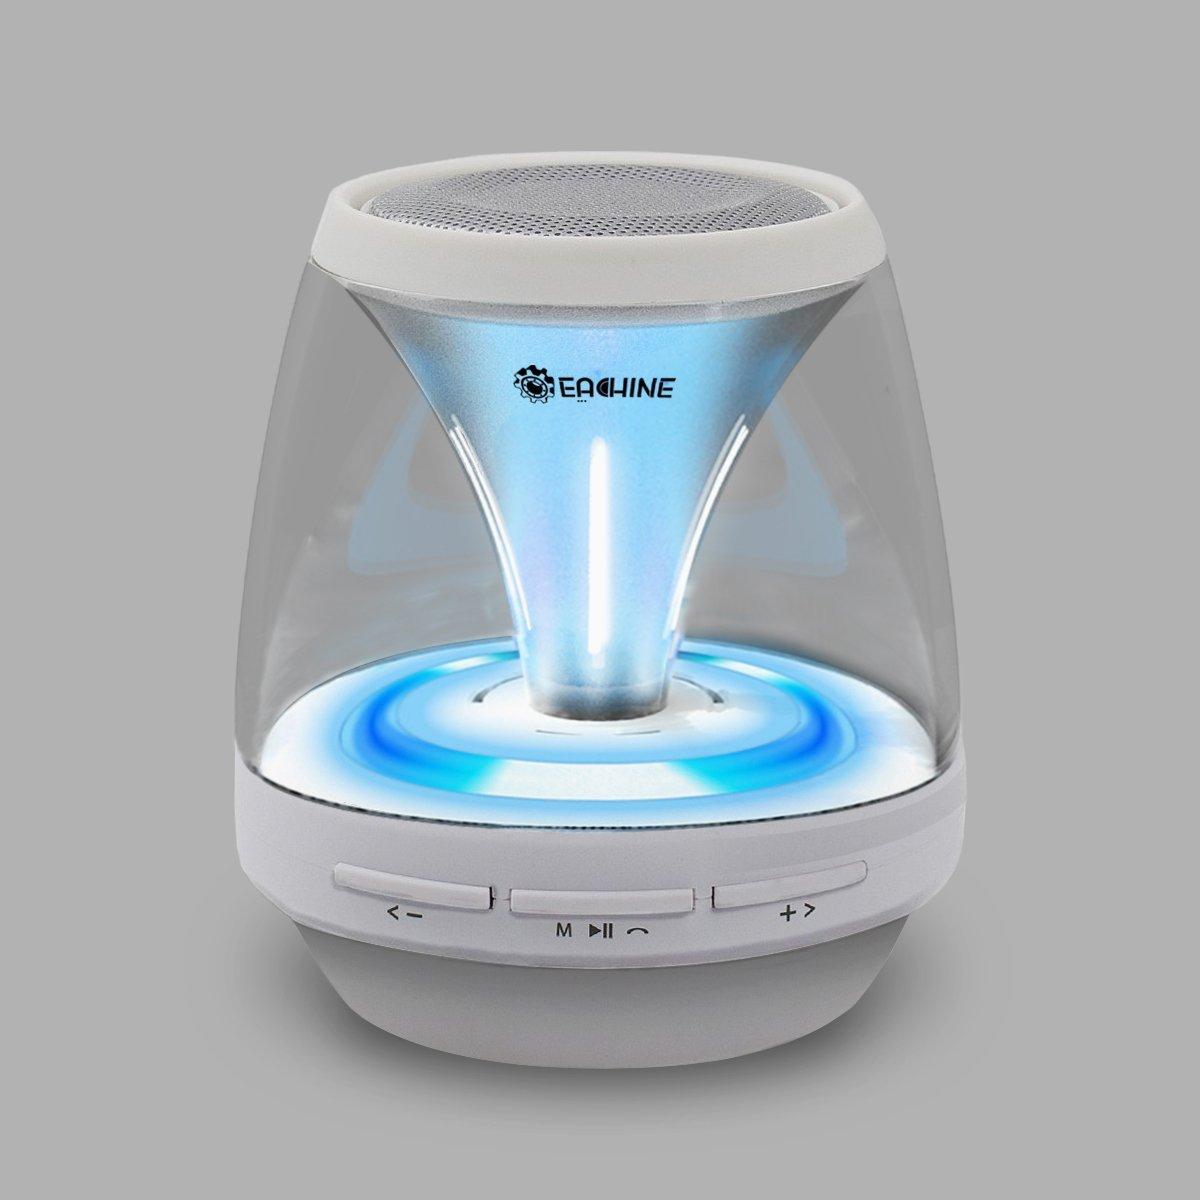 Eachine Bluetooth Speakers, Vivid Jar Portable Wireless LED Lights FM Radio полка дл обуви мастер лана 3п пол 3п дуб сонома мст пол 3п дс 16